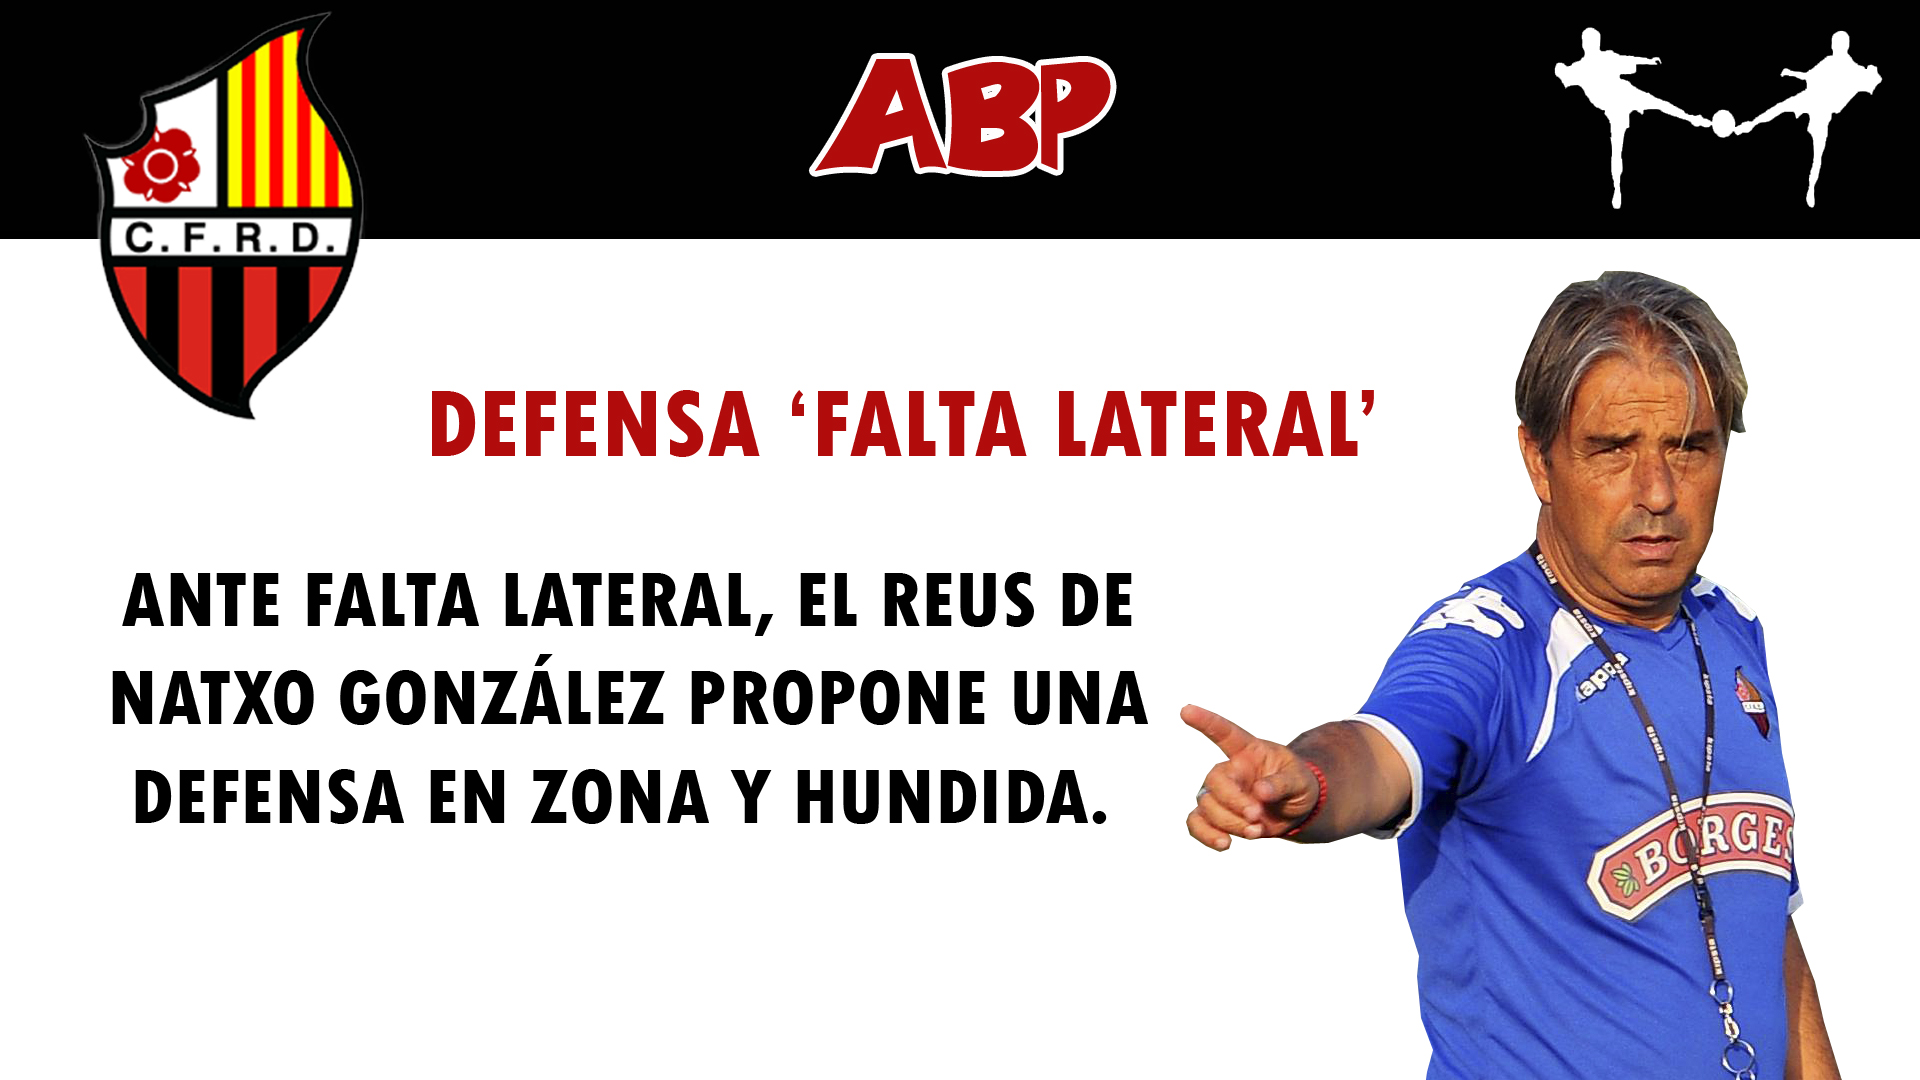 futbolcarrasco reus natxo gonzález falta lateral analisis tactico